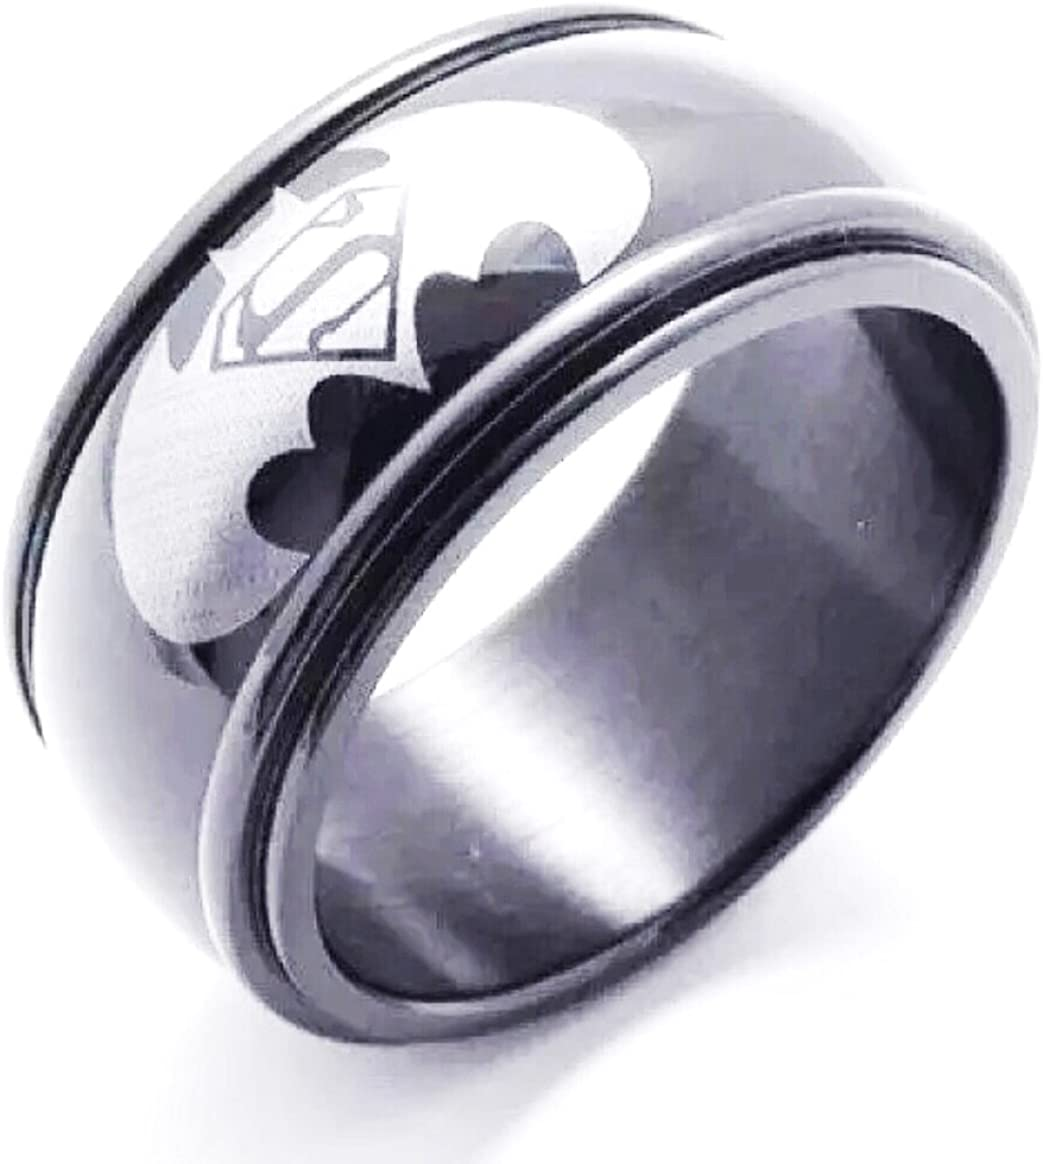 LAVASTORM 8mm Batman Ring Mens Wedding Stainless Steel Engagement Size 6-14 Rings